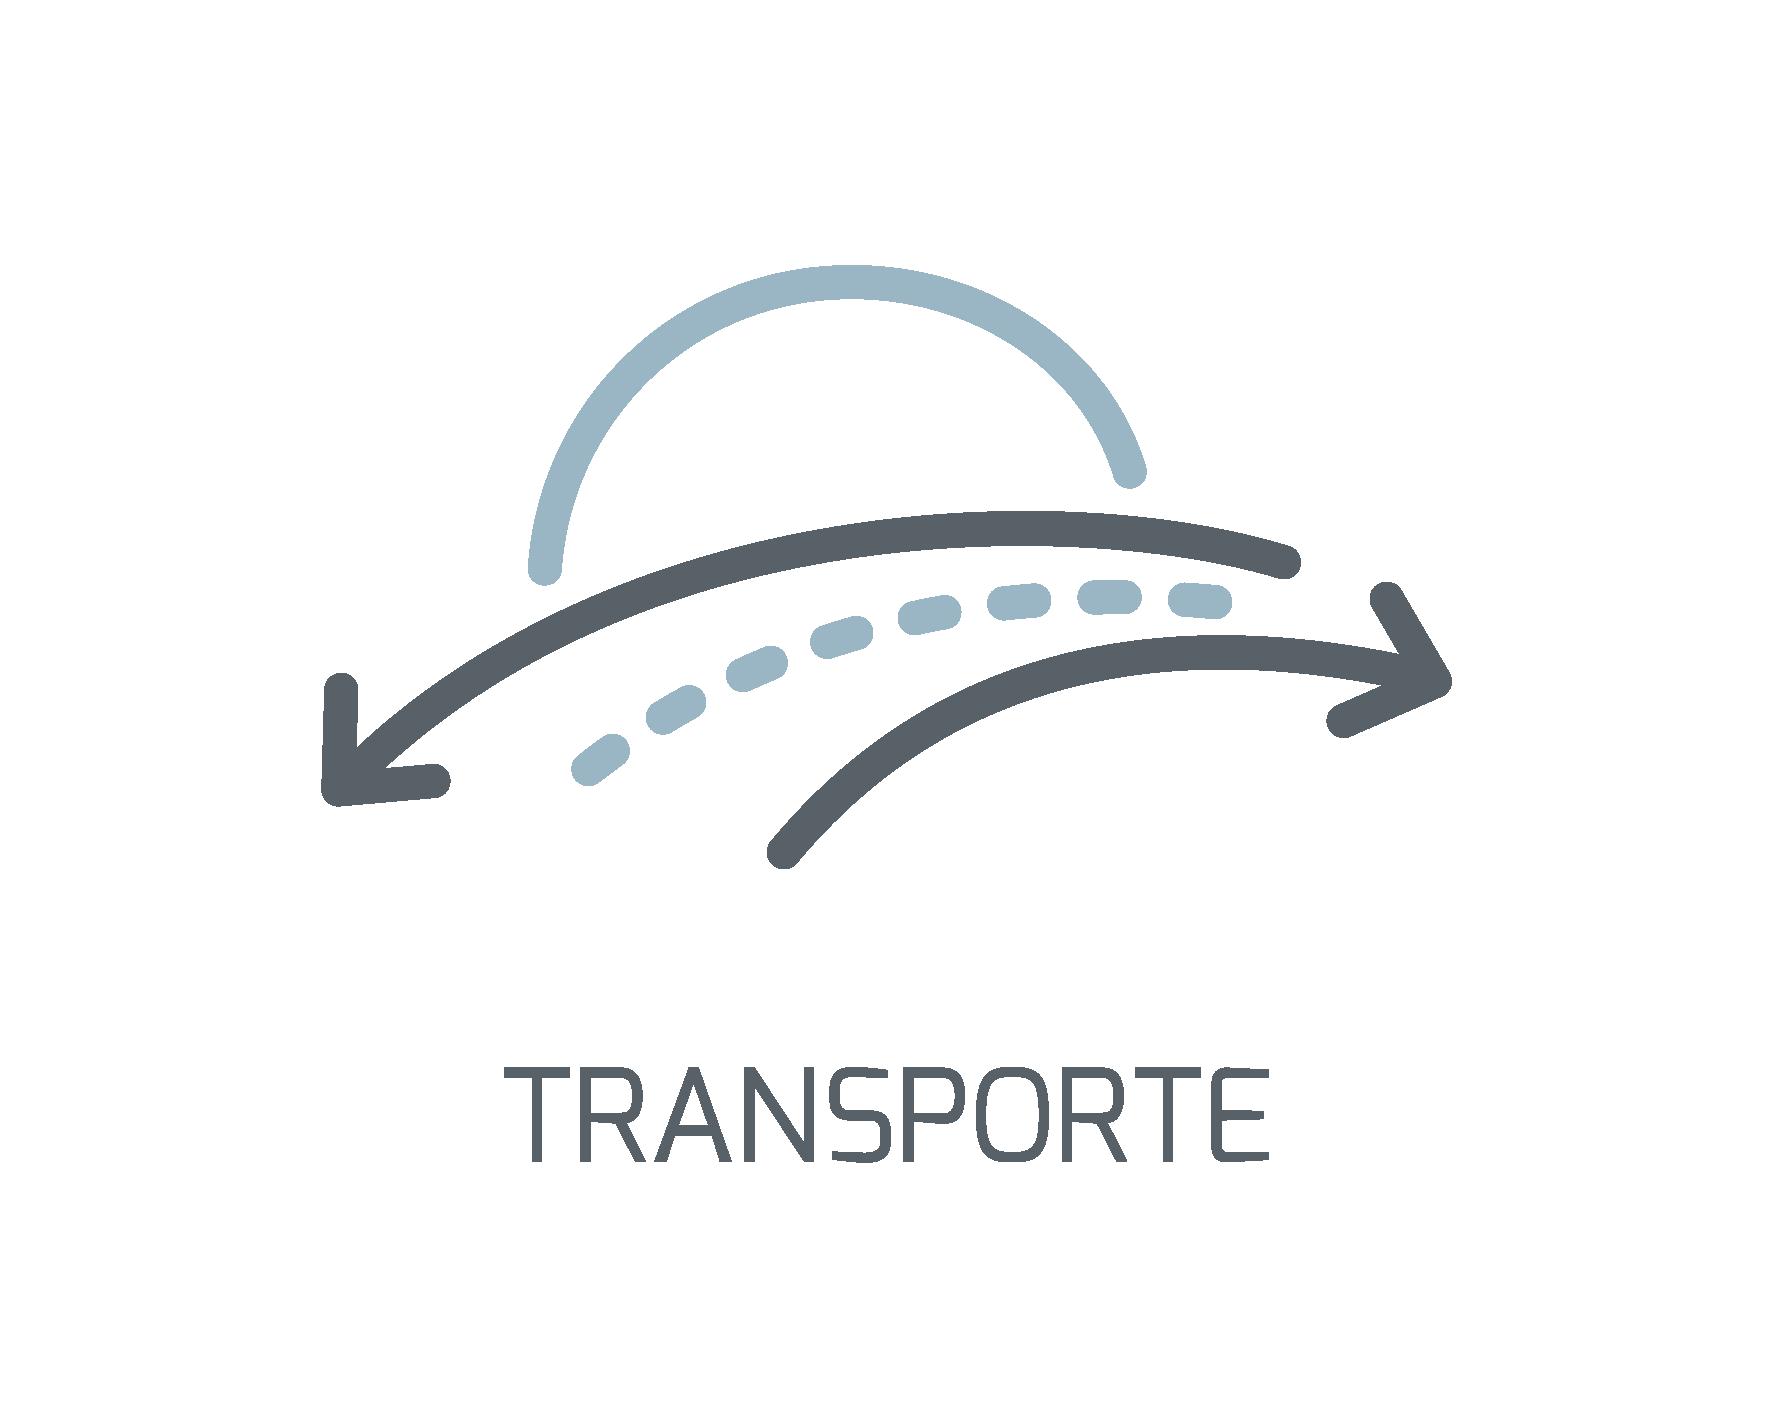 transporte 05 06 2020